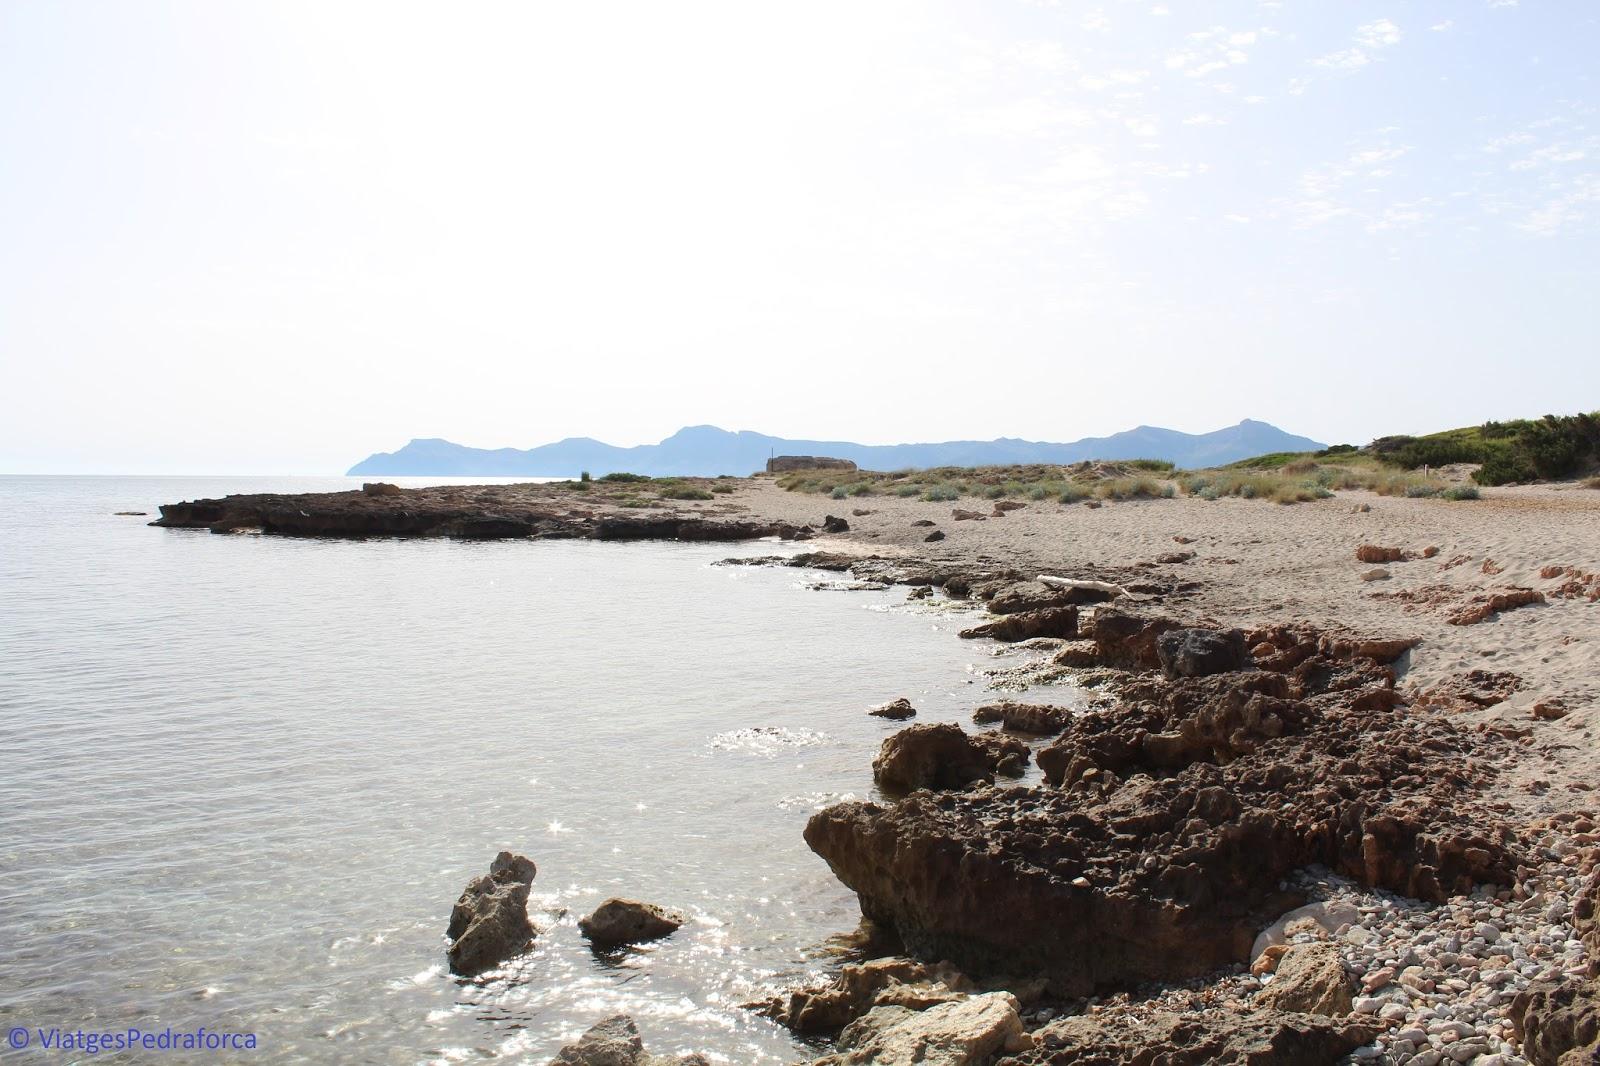 necròpolis de Son Real, arqueologia, talaiots, Mallorca, Illes Balears